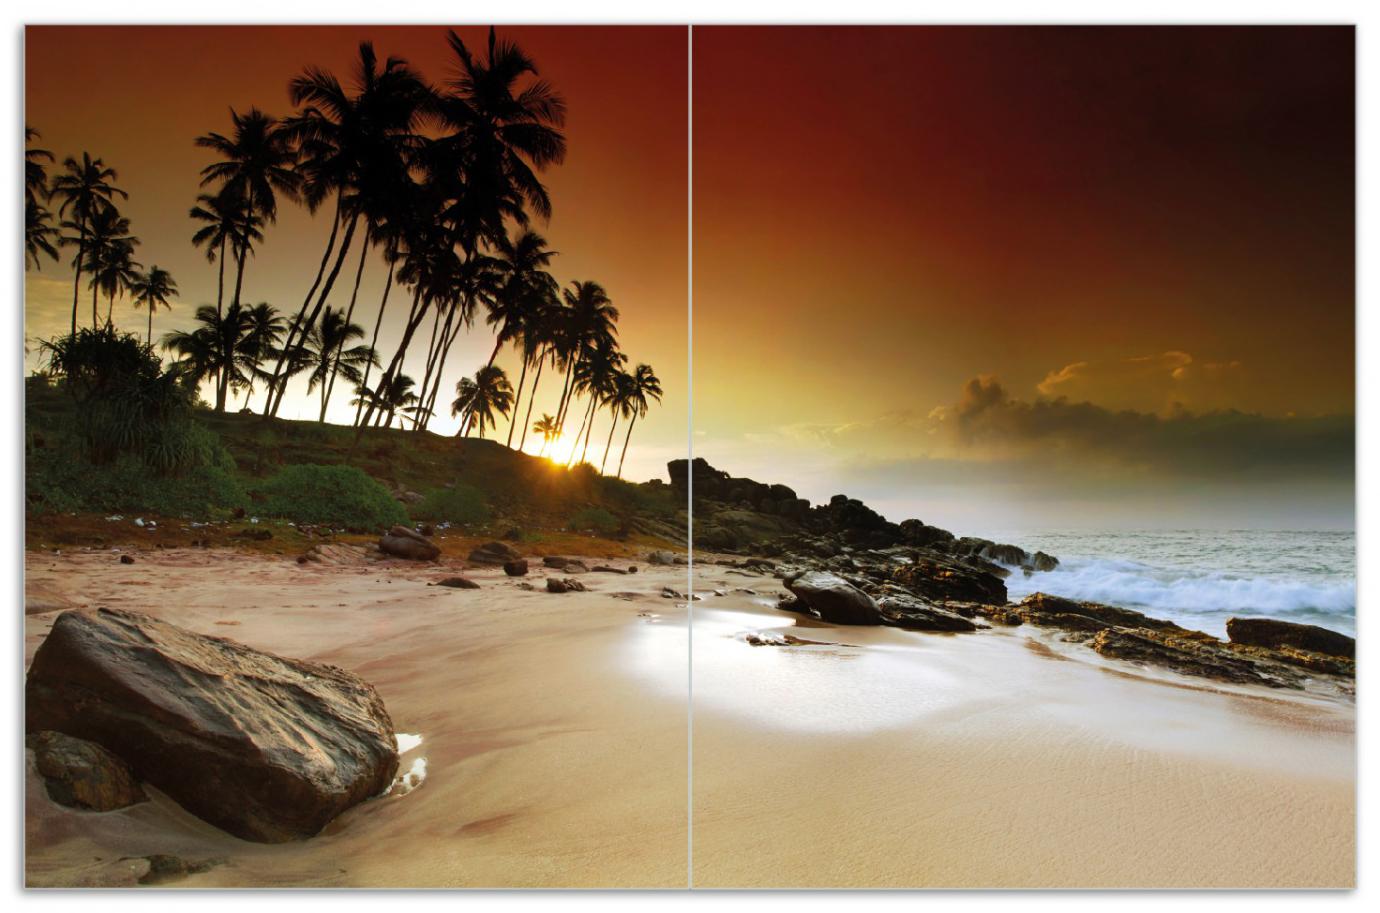 Herdabdeckplatte Sri Lanka - Palmenstrand mit Sonnenuntergang – Bild 1